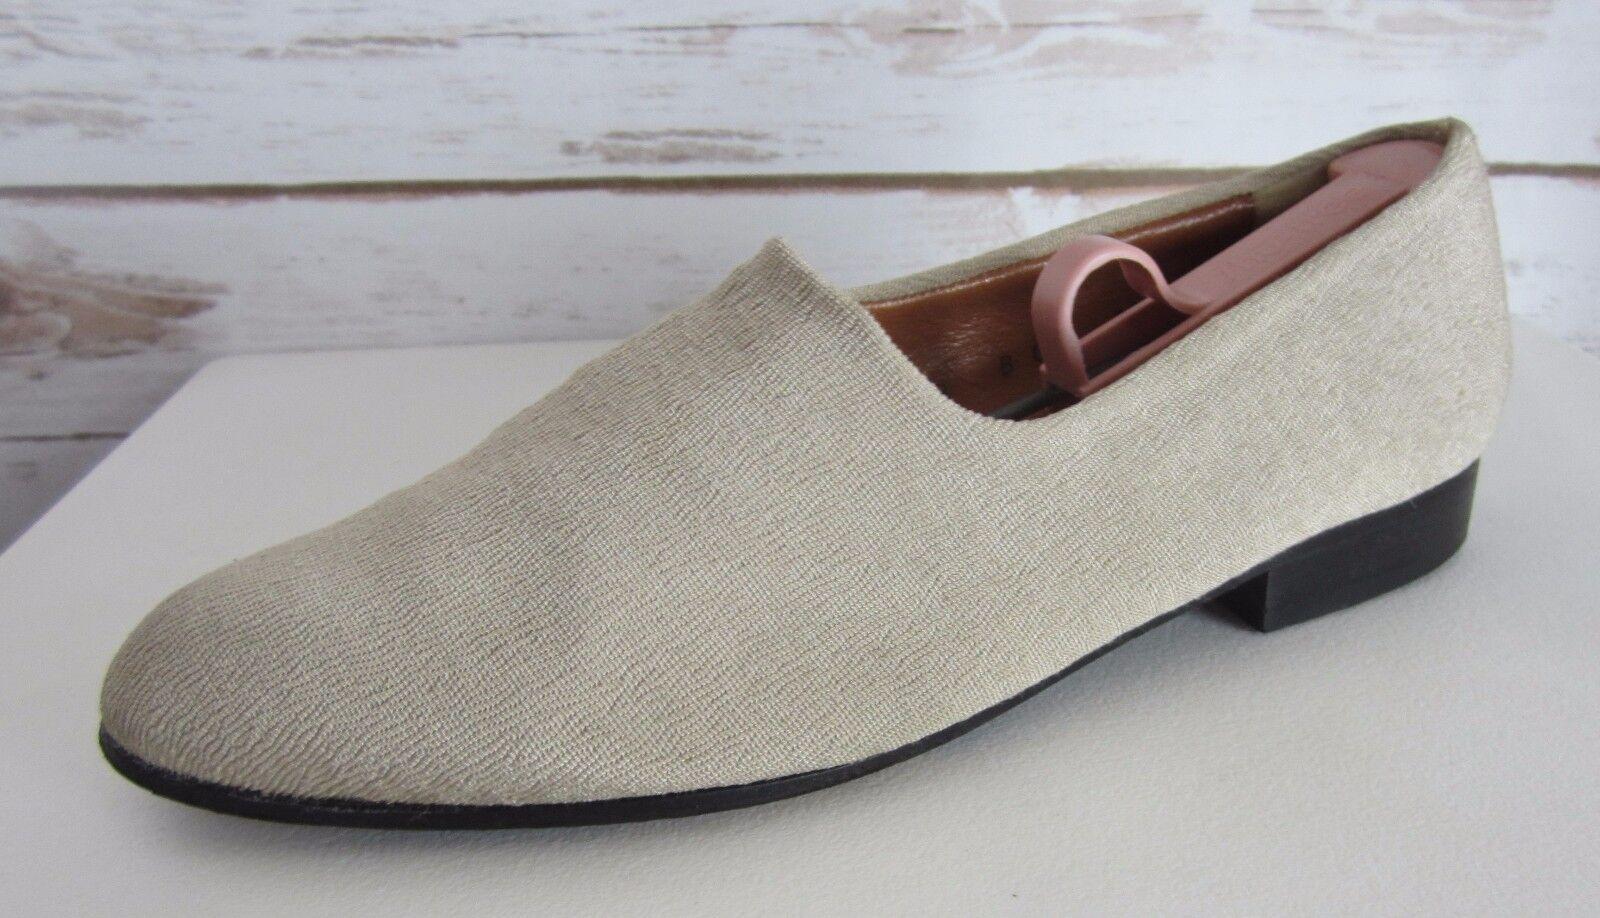 ROBERT CLERGERIE France Damenschuhe Beige Cloth Loafers Leder Slip On Flats Loafers Cloth US 8 B b7c2c1